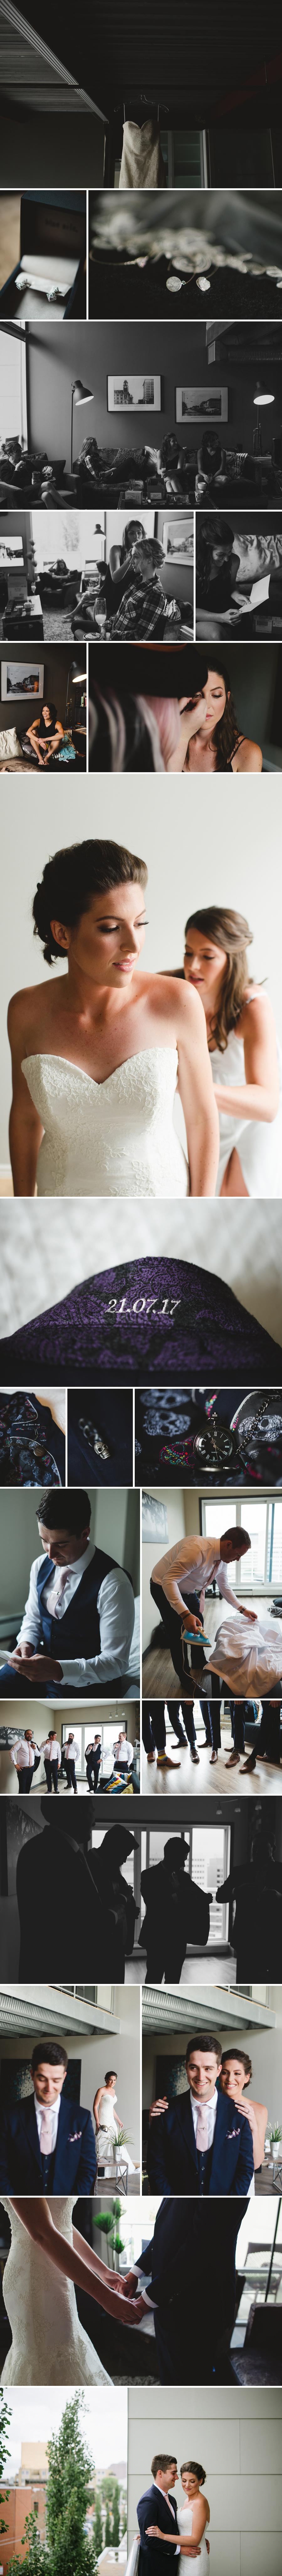 bbcollective_yeg_photography_wedding_breannaandhunter_edmonton_married_2017